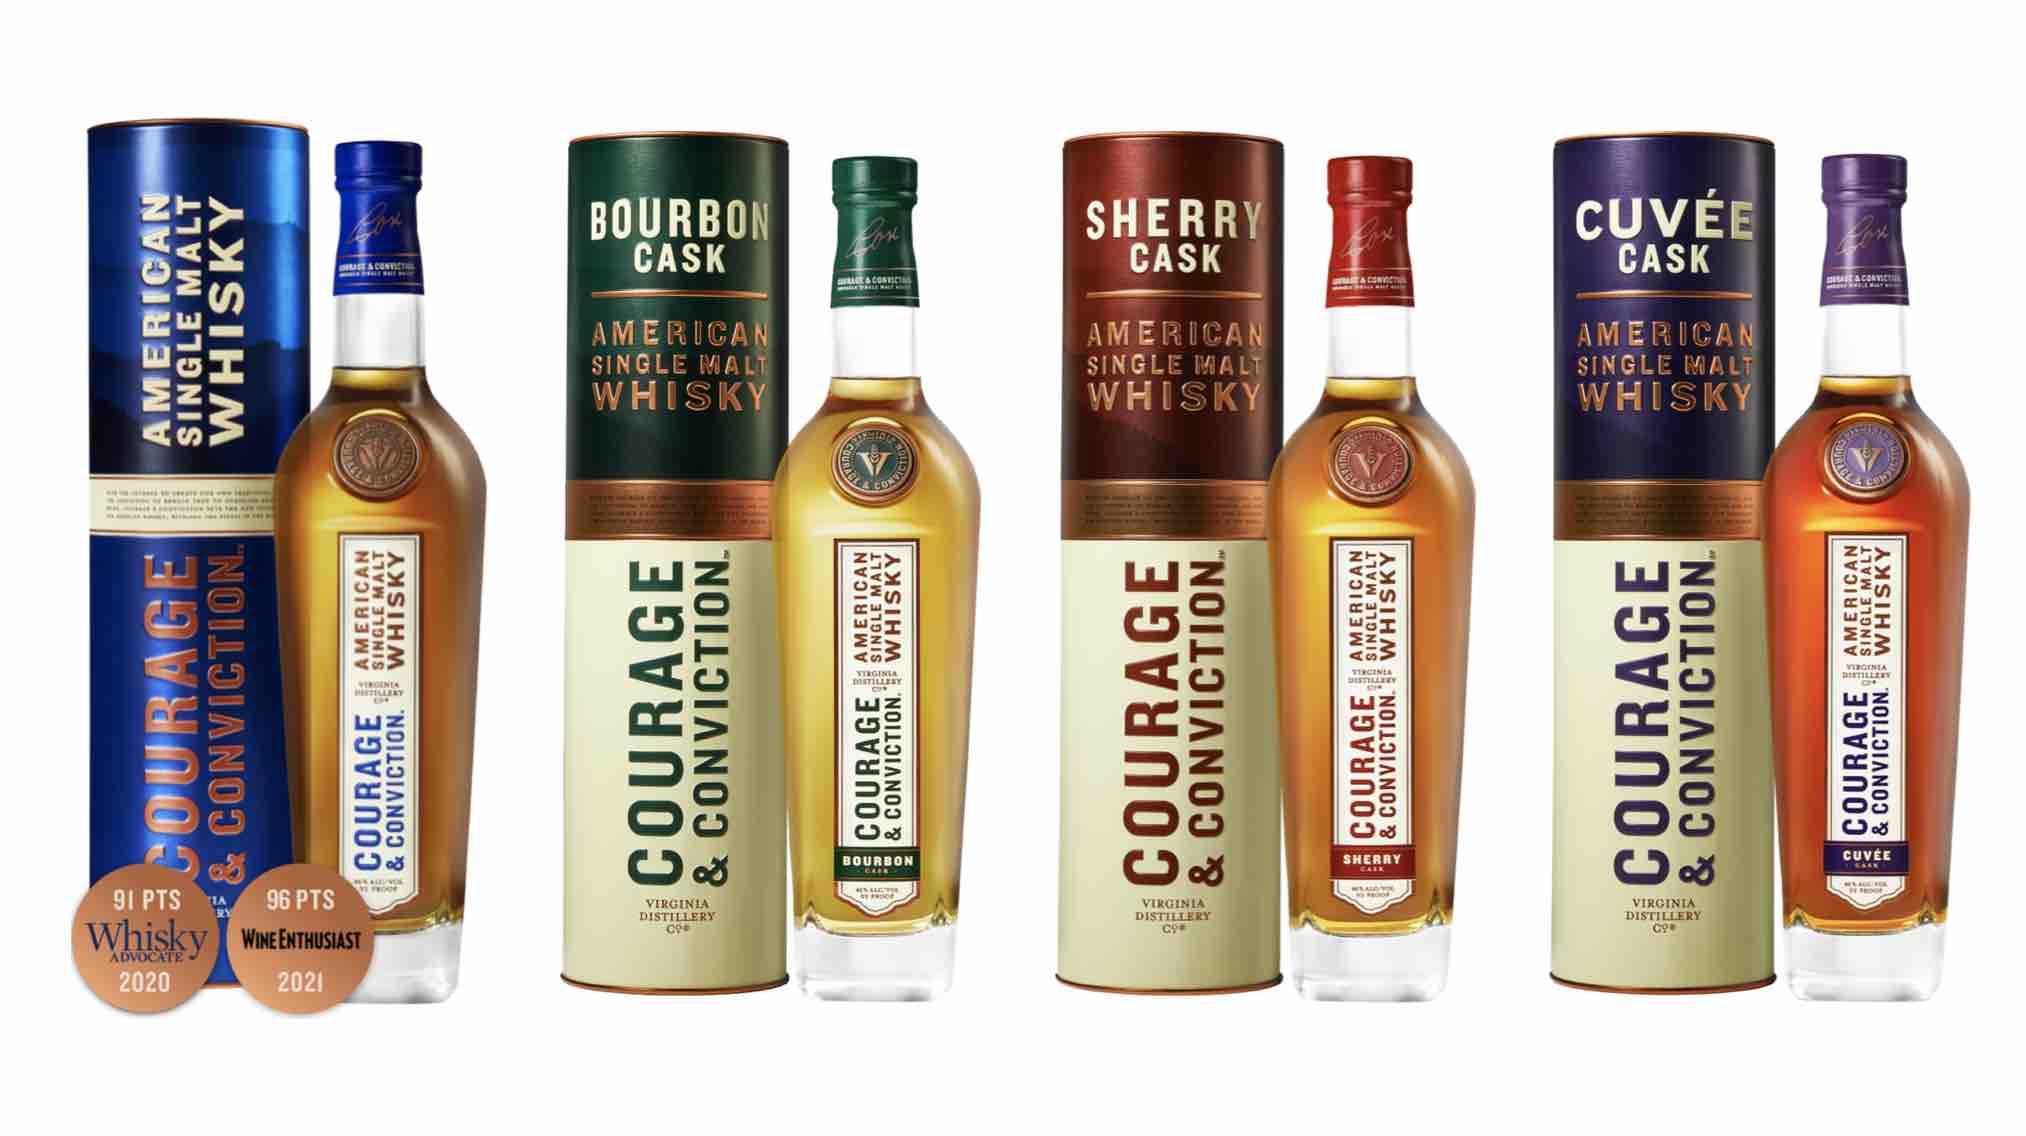 Virginia Distillery Co. – Courage & Conviction American Single Malt Whisky, Courage & Conviction Bourbon Cask, Courage & Conviction Sherry Cask, and Courage & Conviction Cuvée Cask